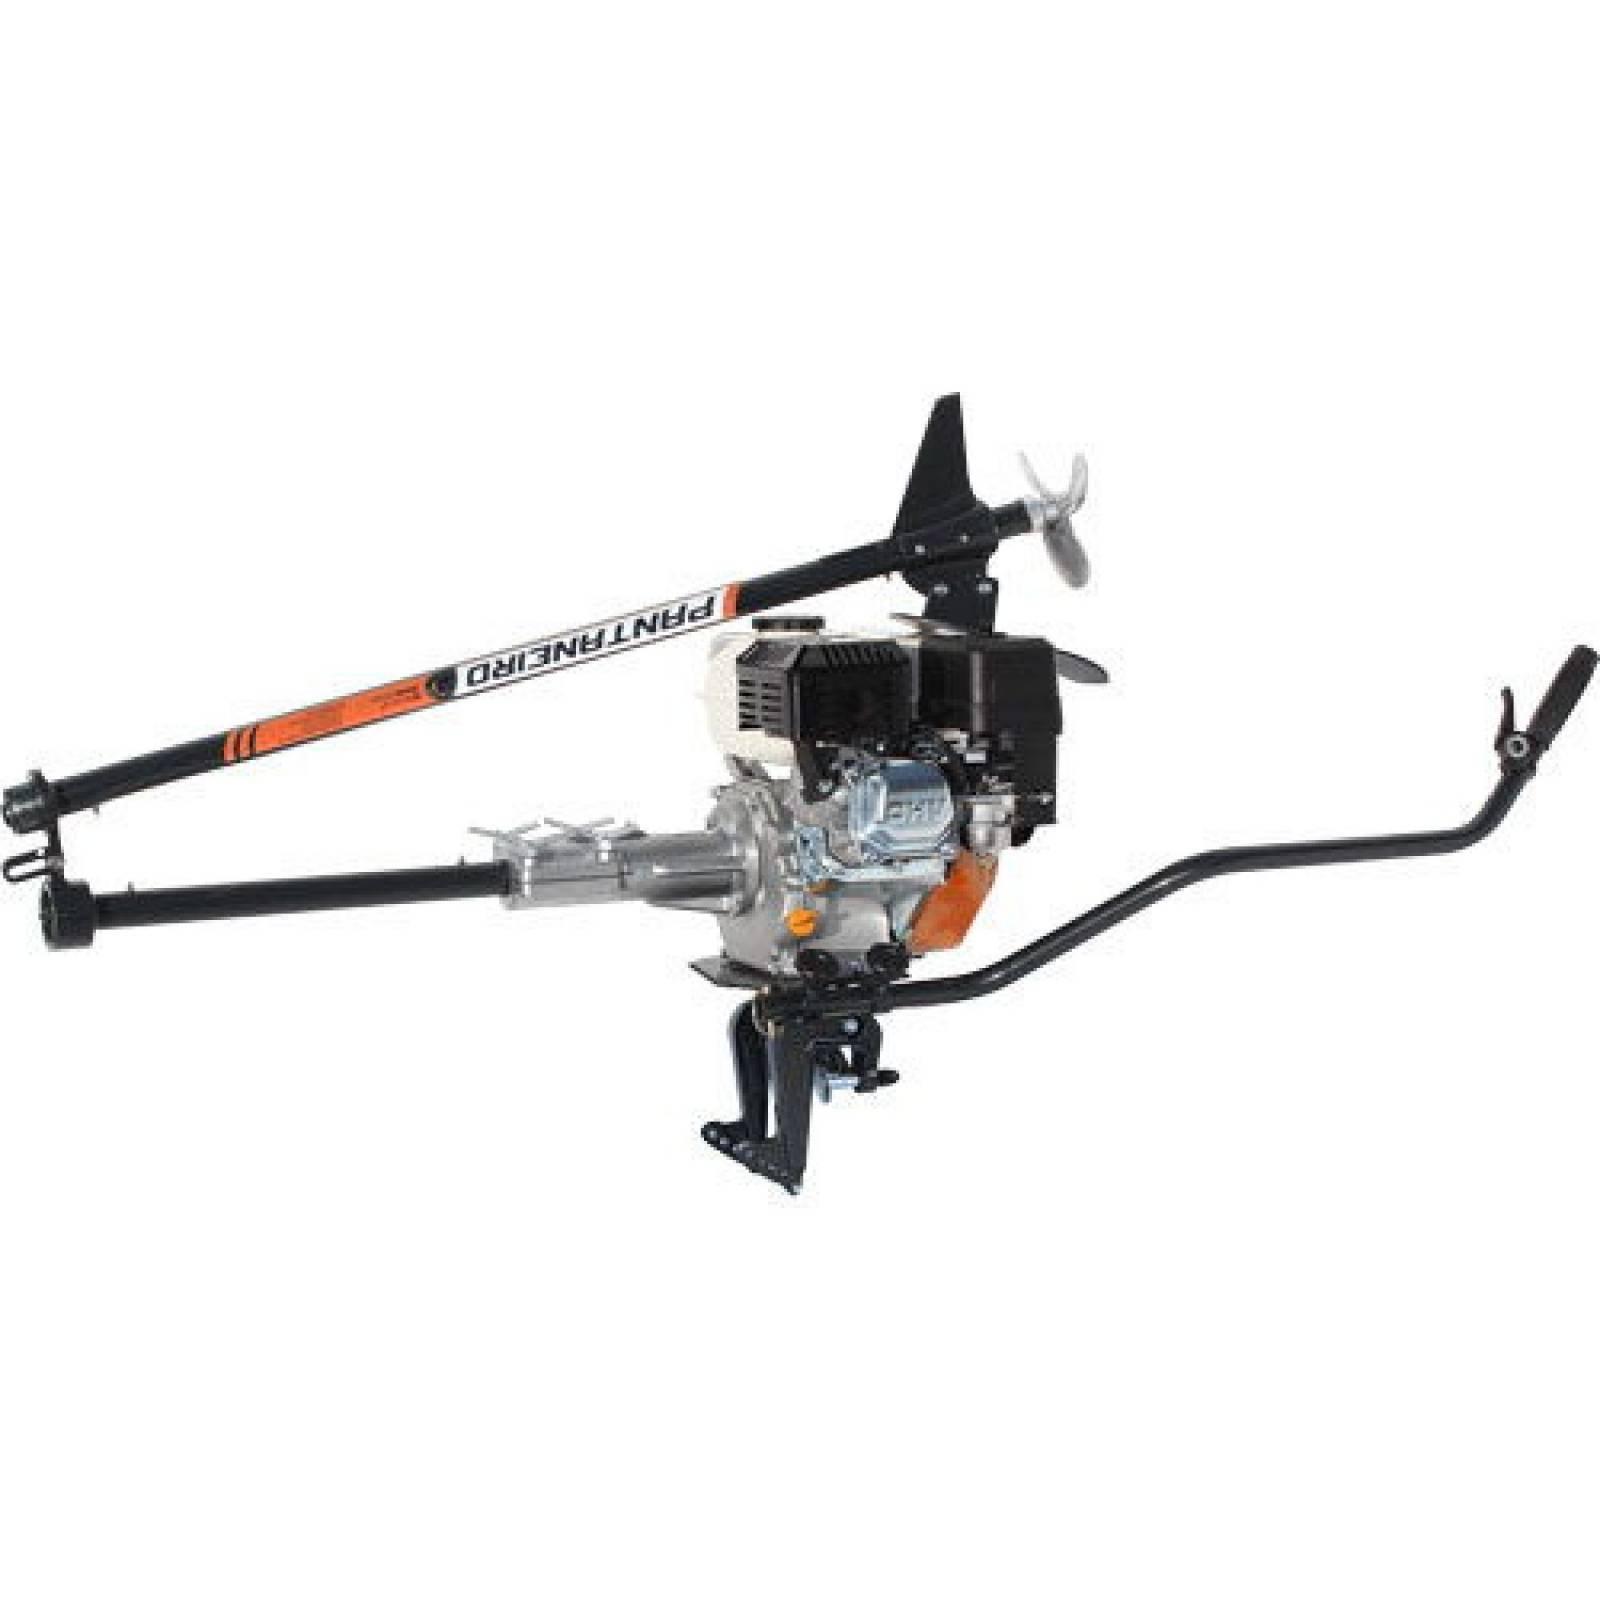 Rabeta Aço Pratic Dobrável Motor branco 13 hp 1,7m - Pesca e Campo